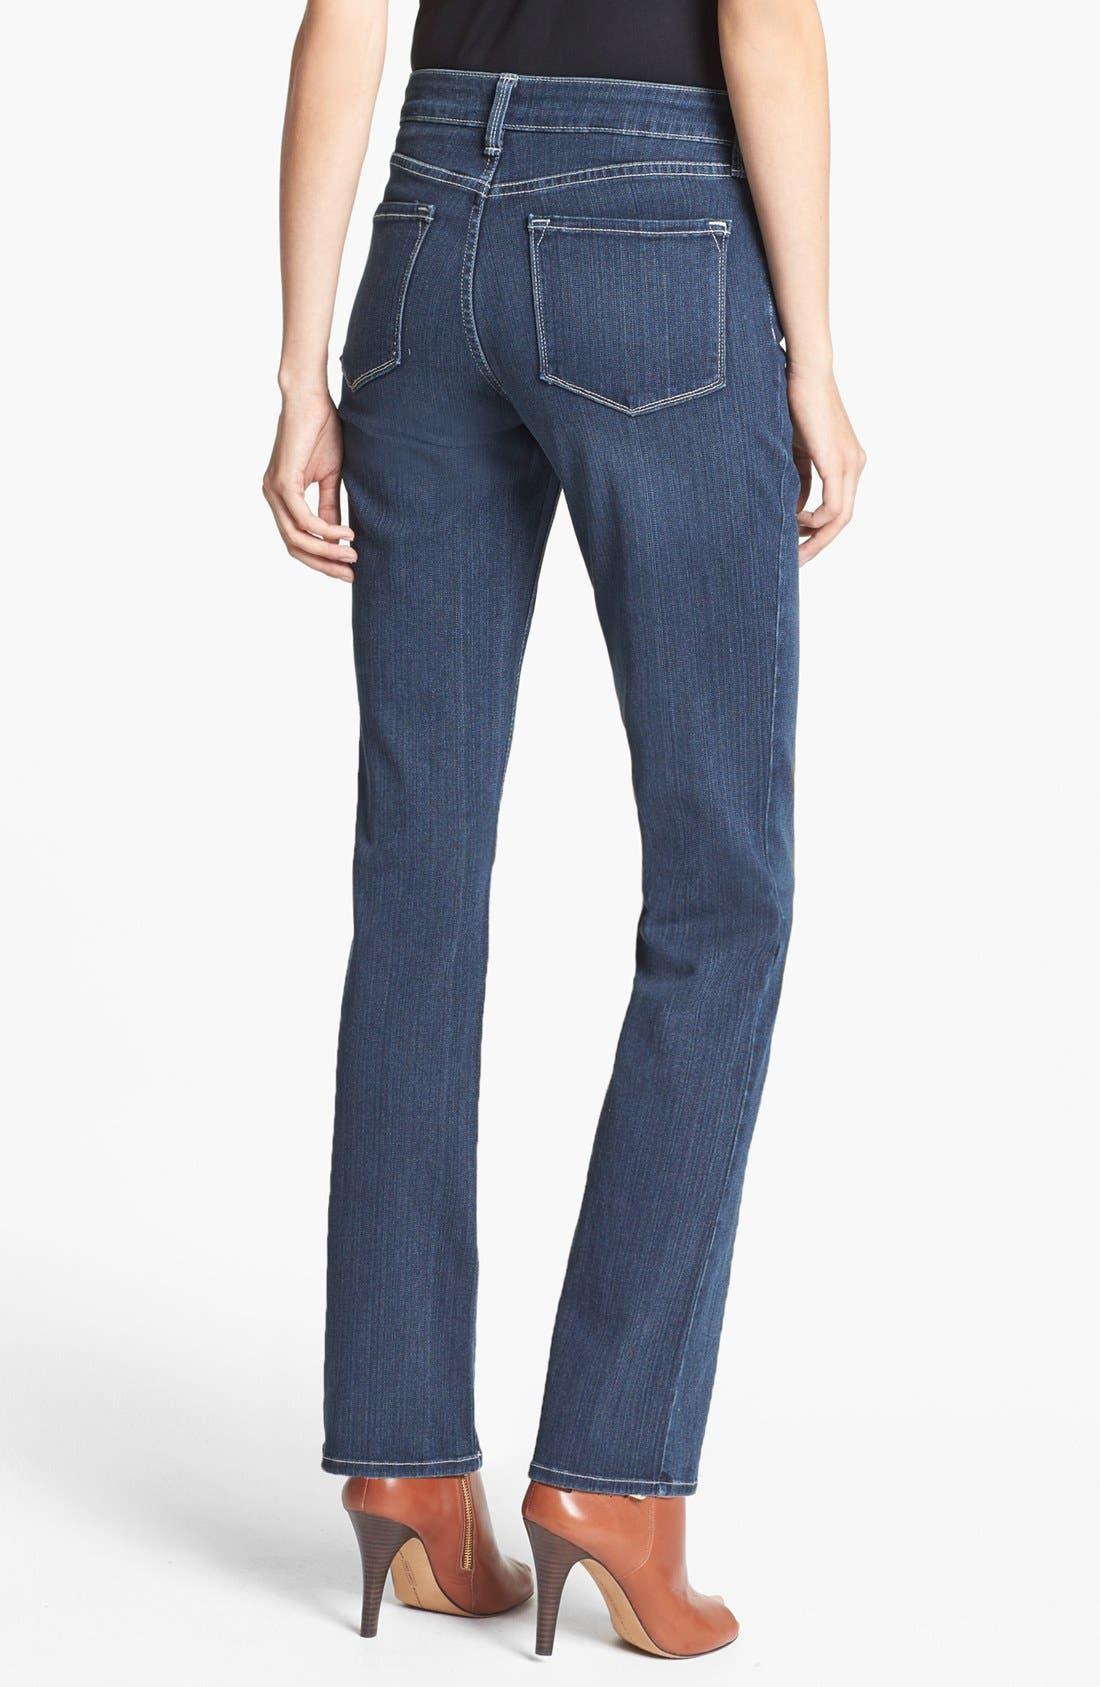 Alternate Image 2  - NYDJ 'Barbara' Stretch Bootcut Jeans (Coral Sea)